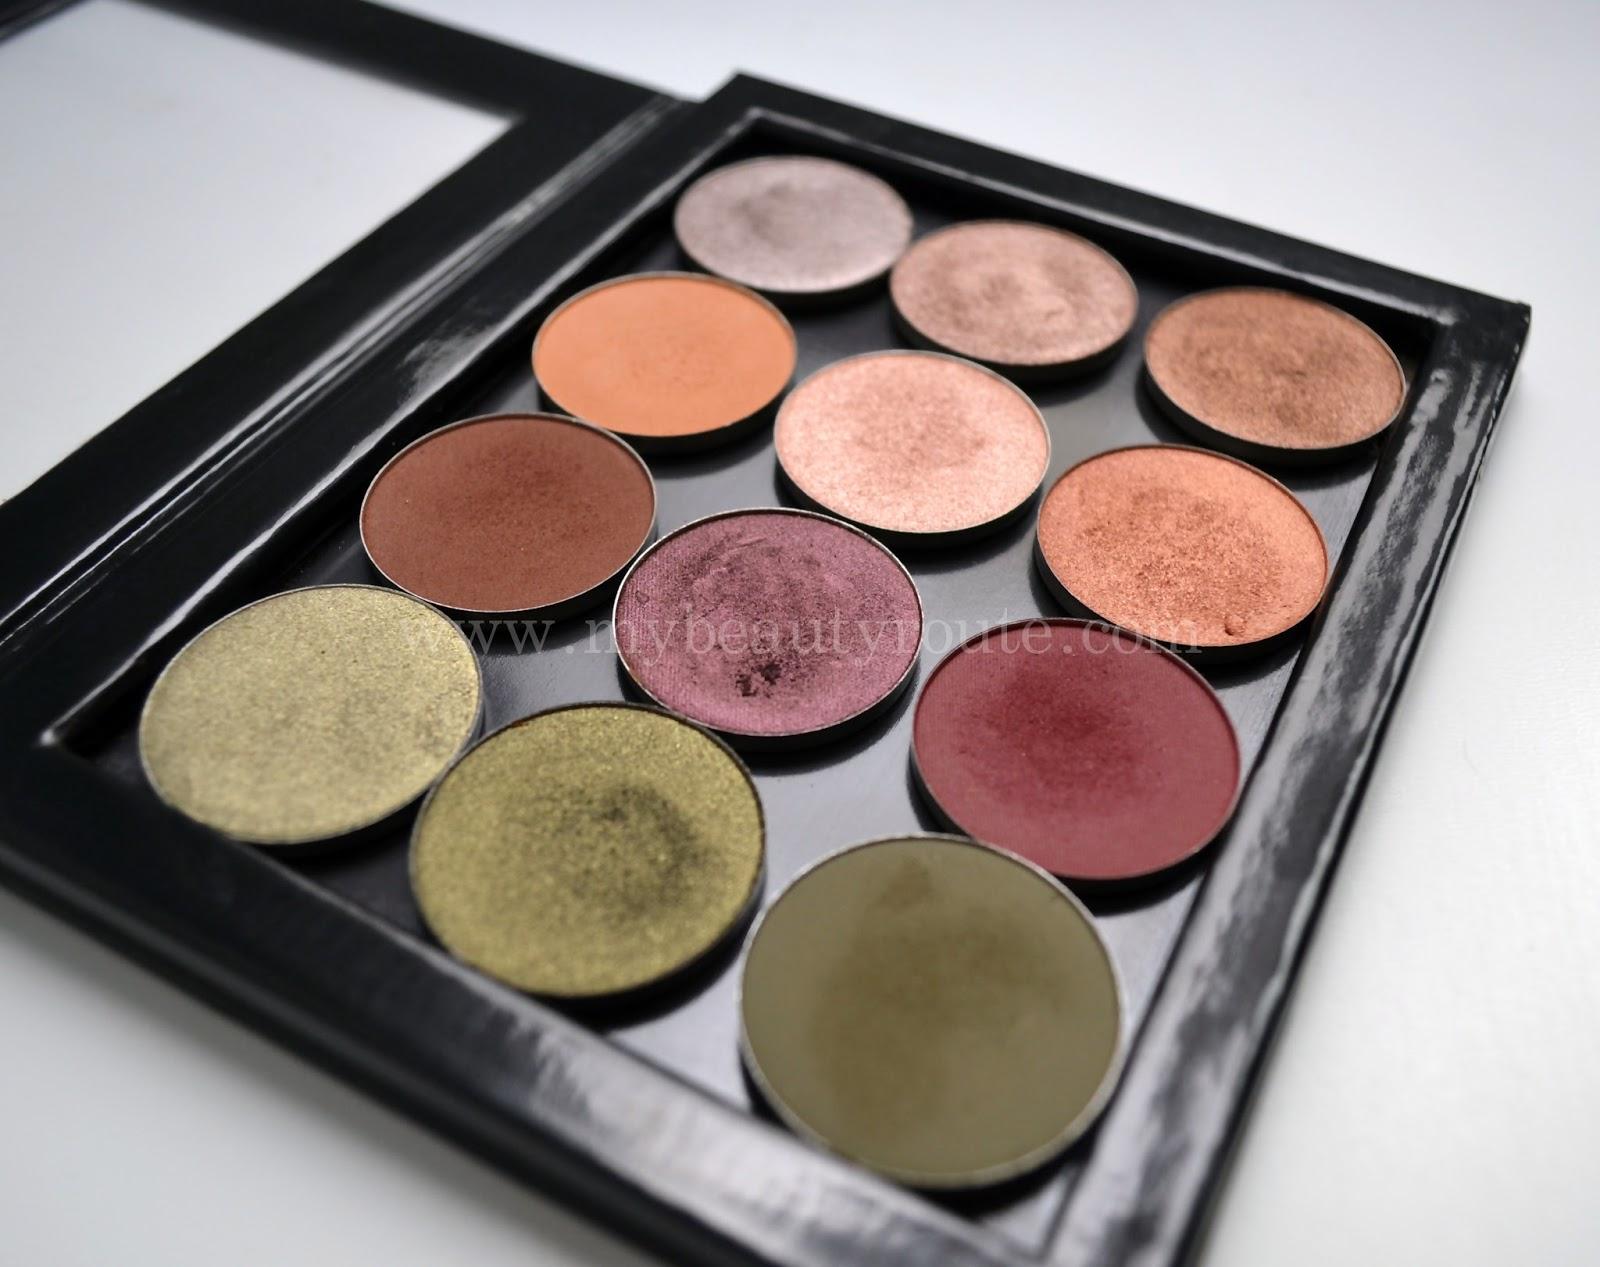 Perspectiva 2 paleta sombras de maquillaje tonos neutros Nabla cosmetcis